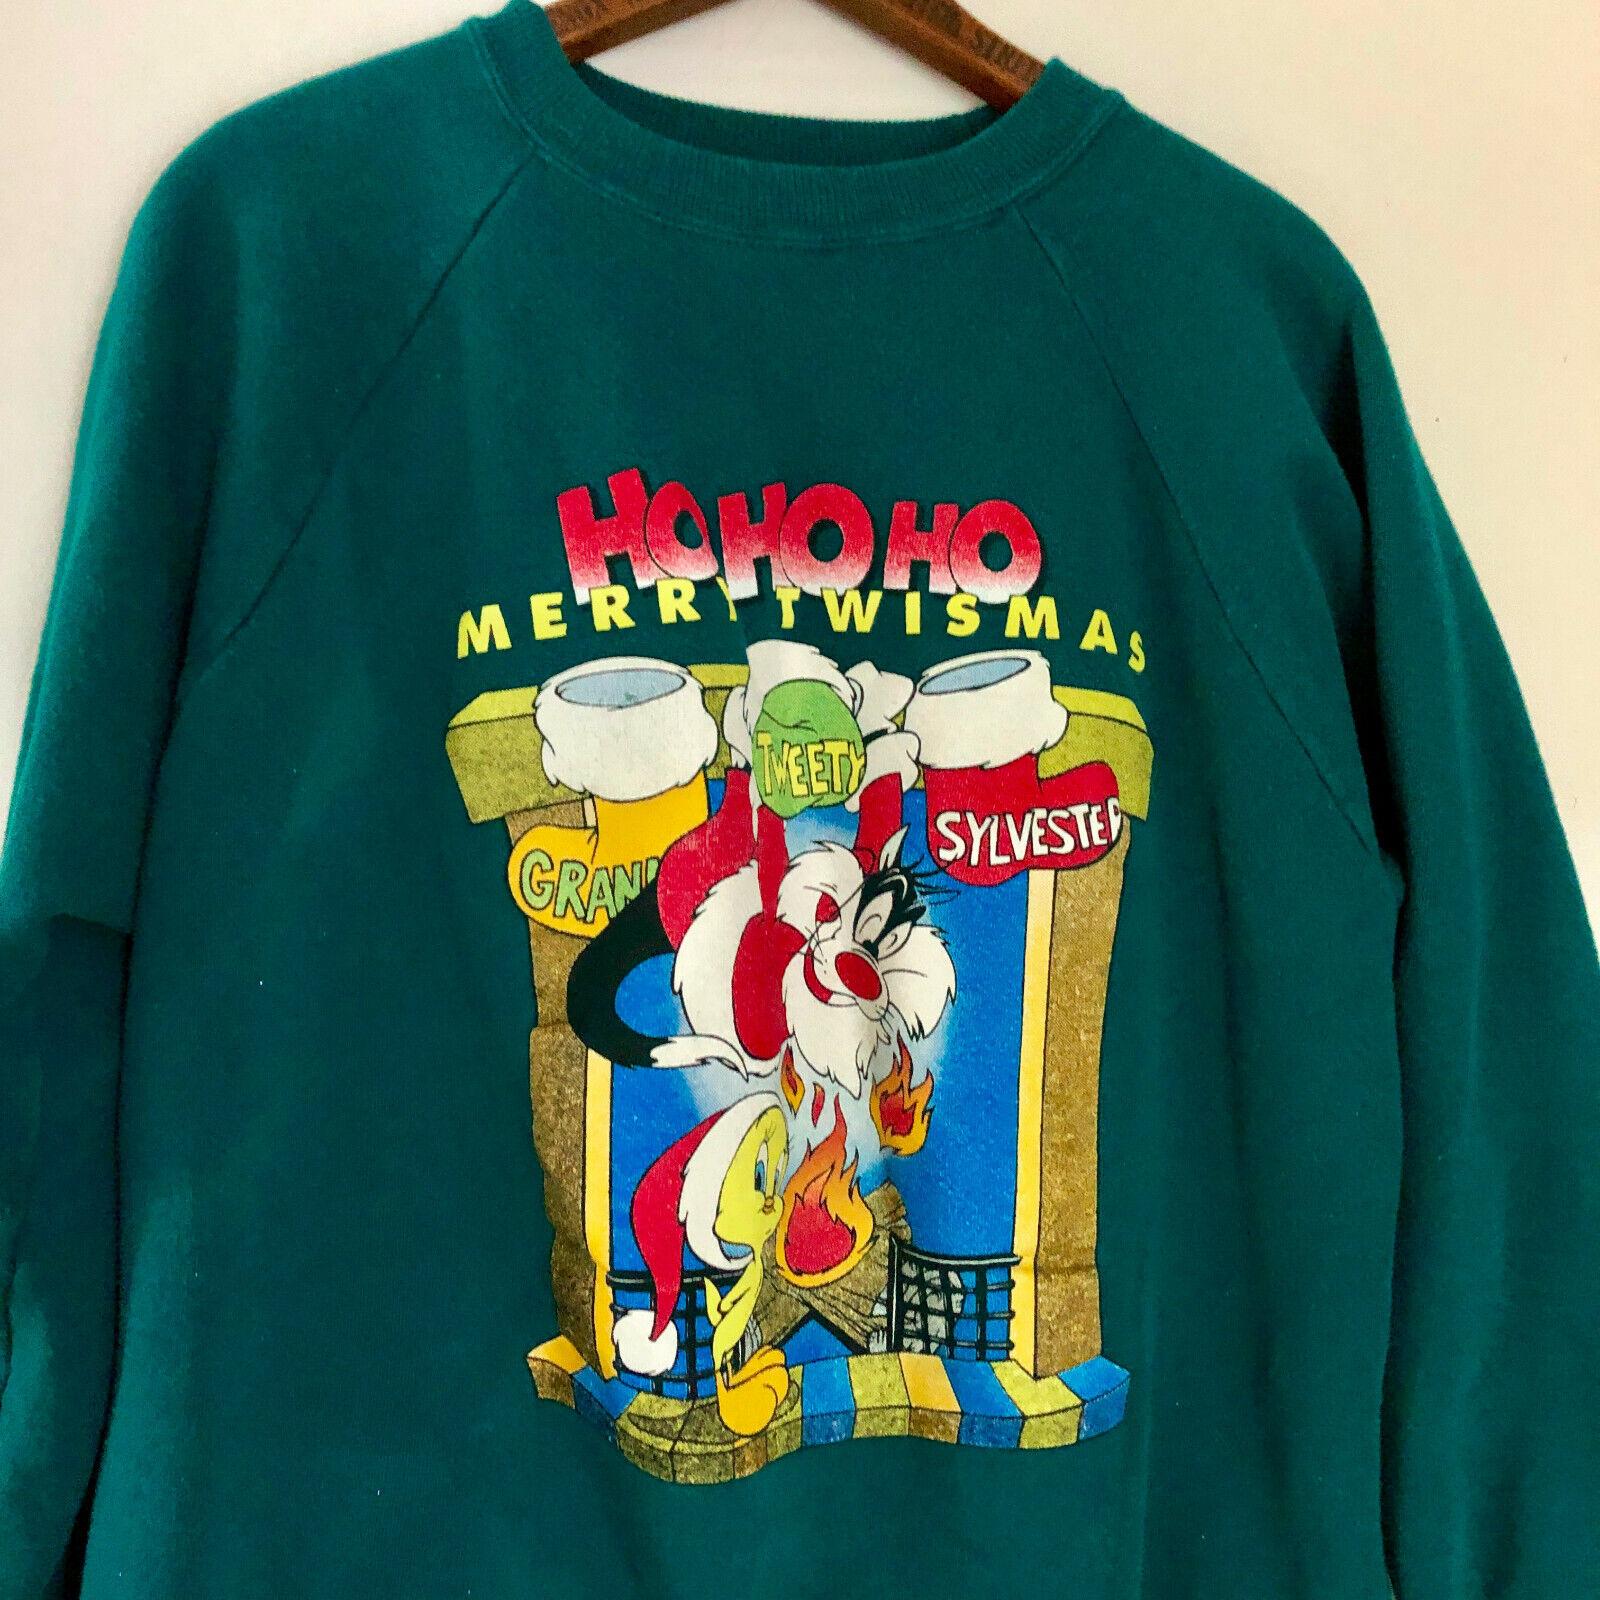 Vintage 90s Looney Tunes Sweatshirt Medium M Tweety Bird Sylvester Cat Christmas